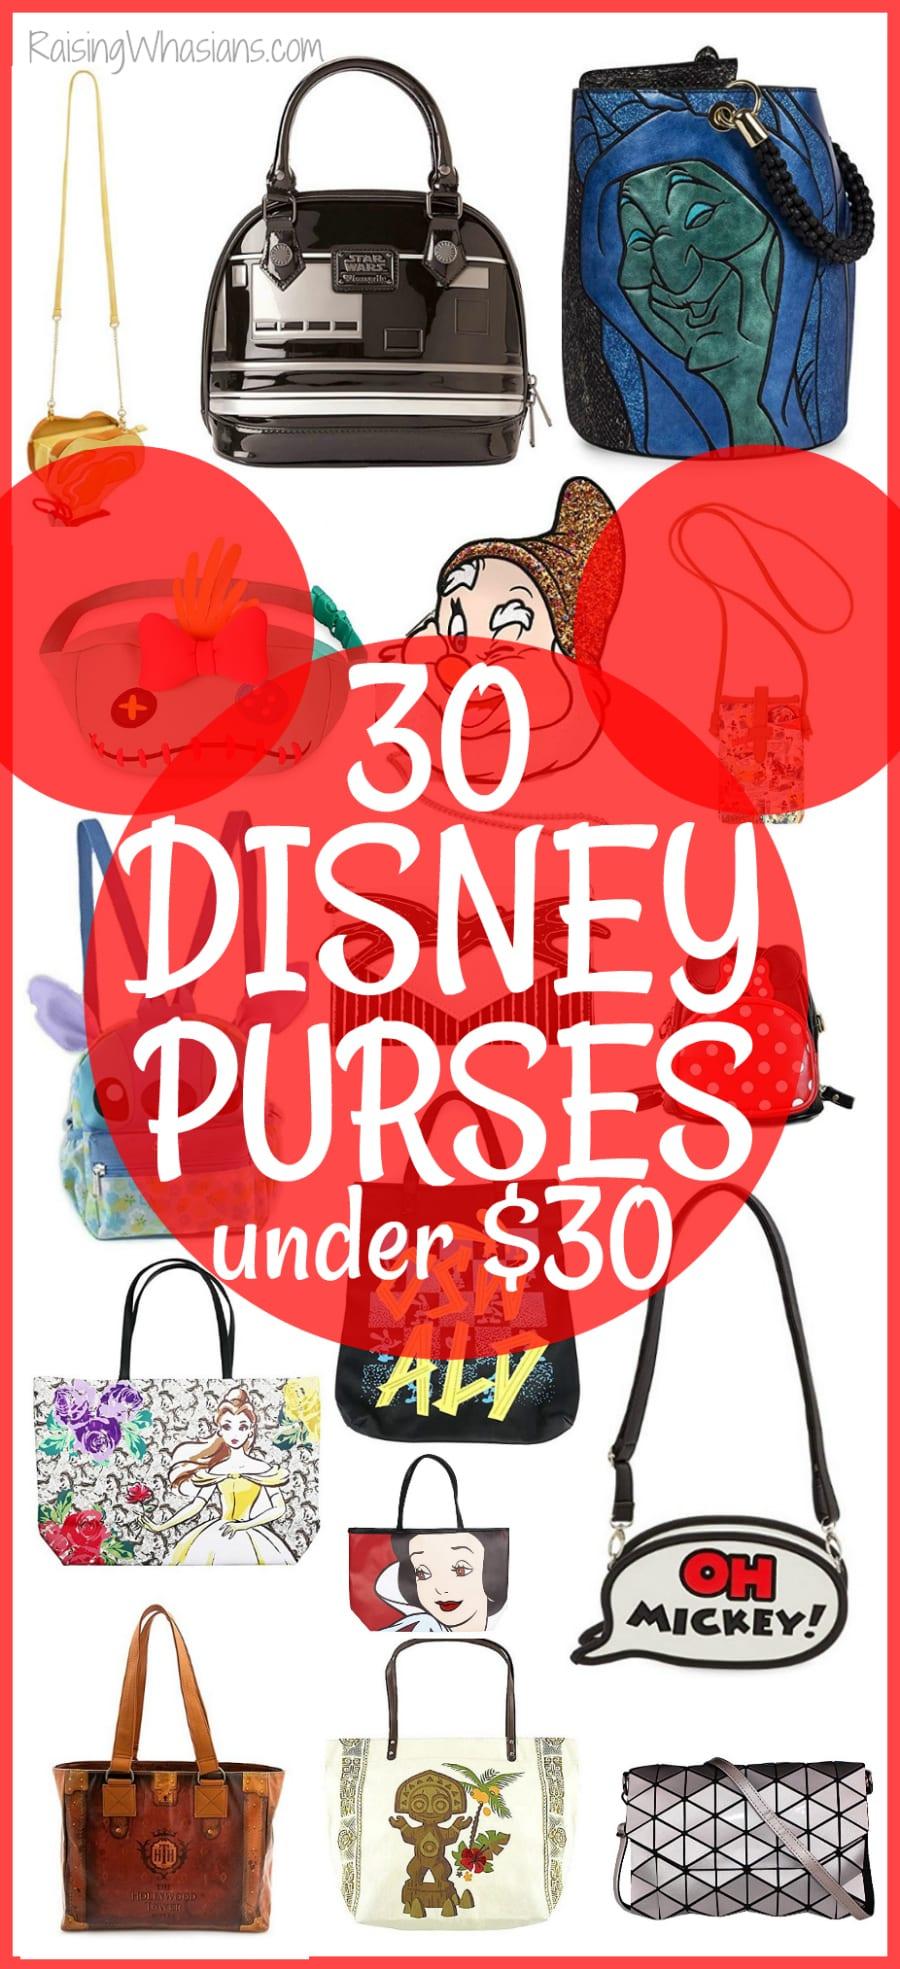 Disney purses under 30